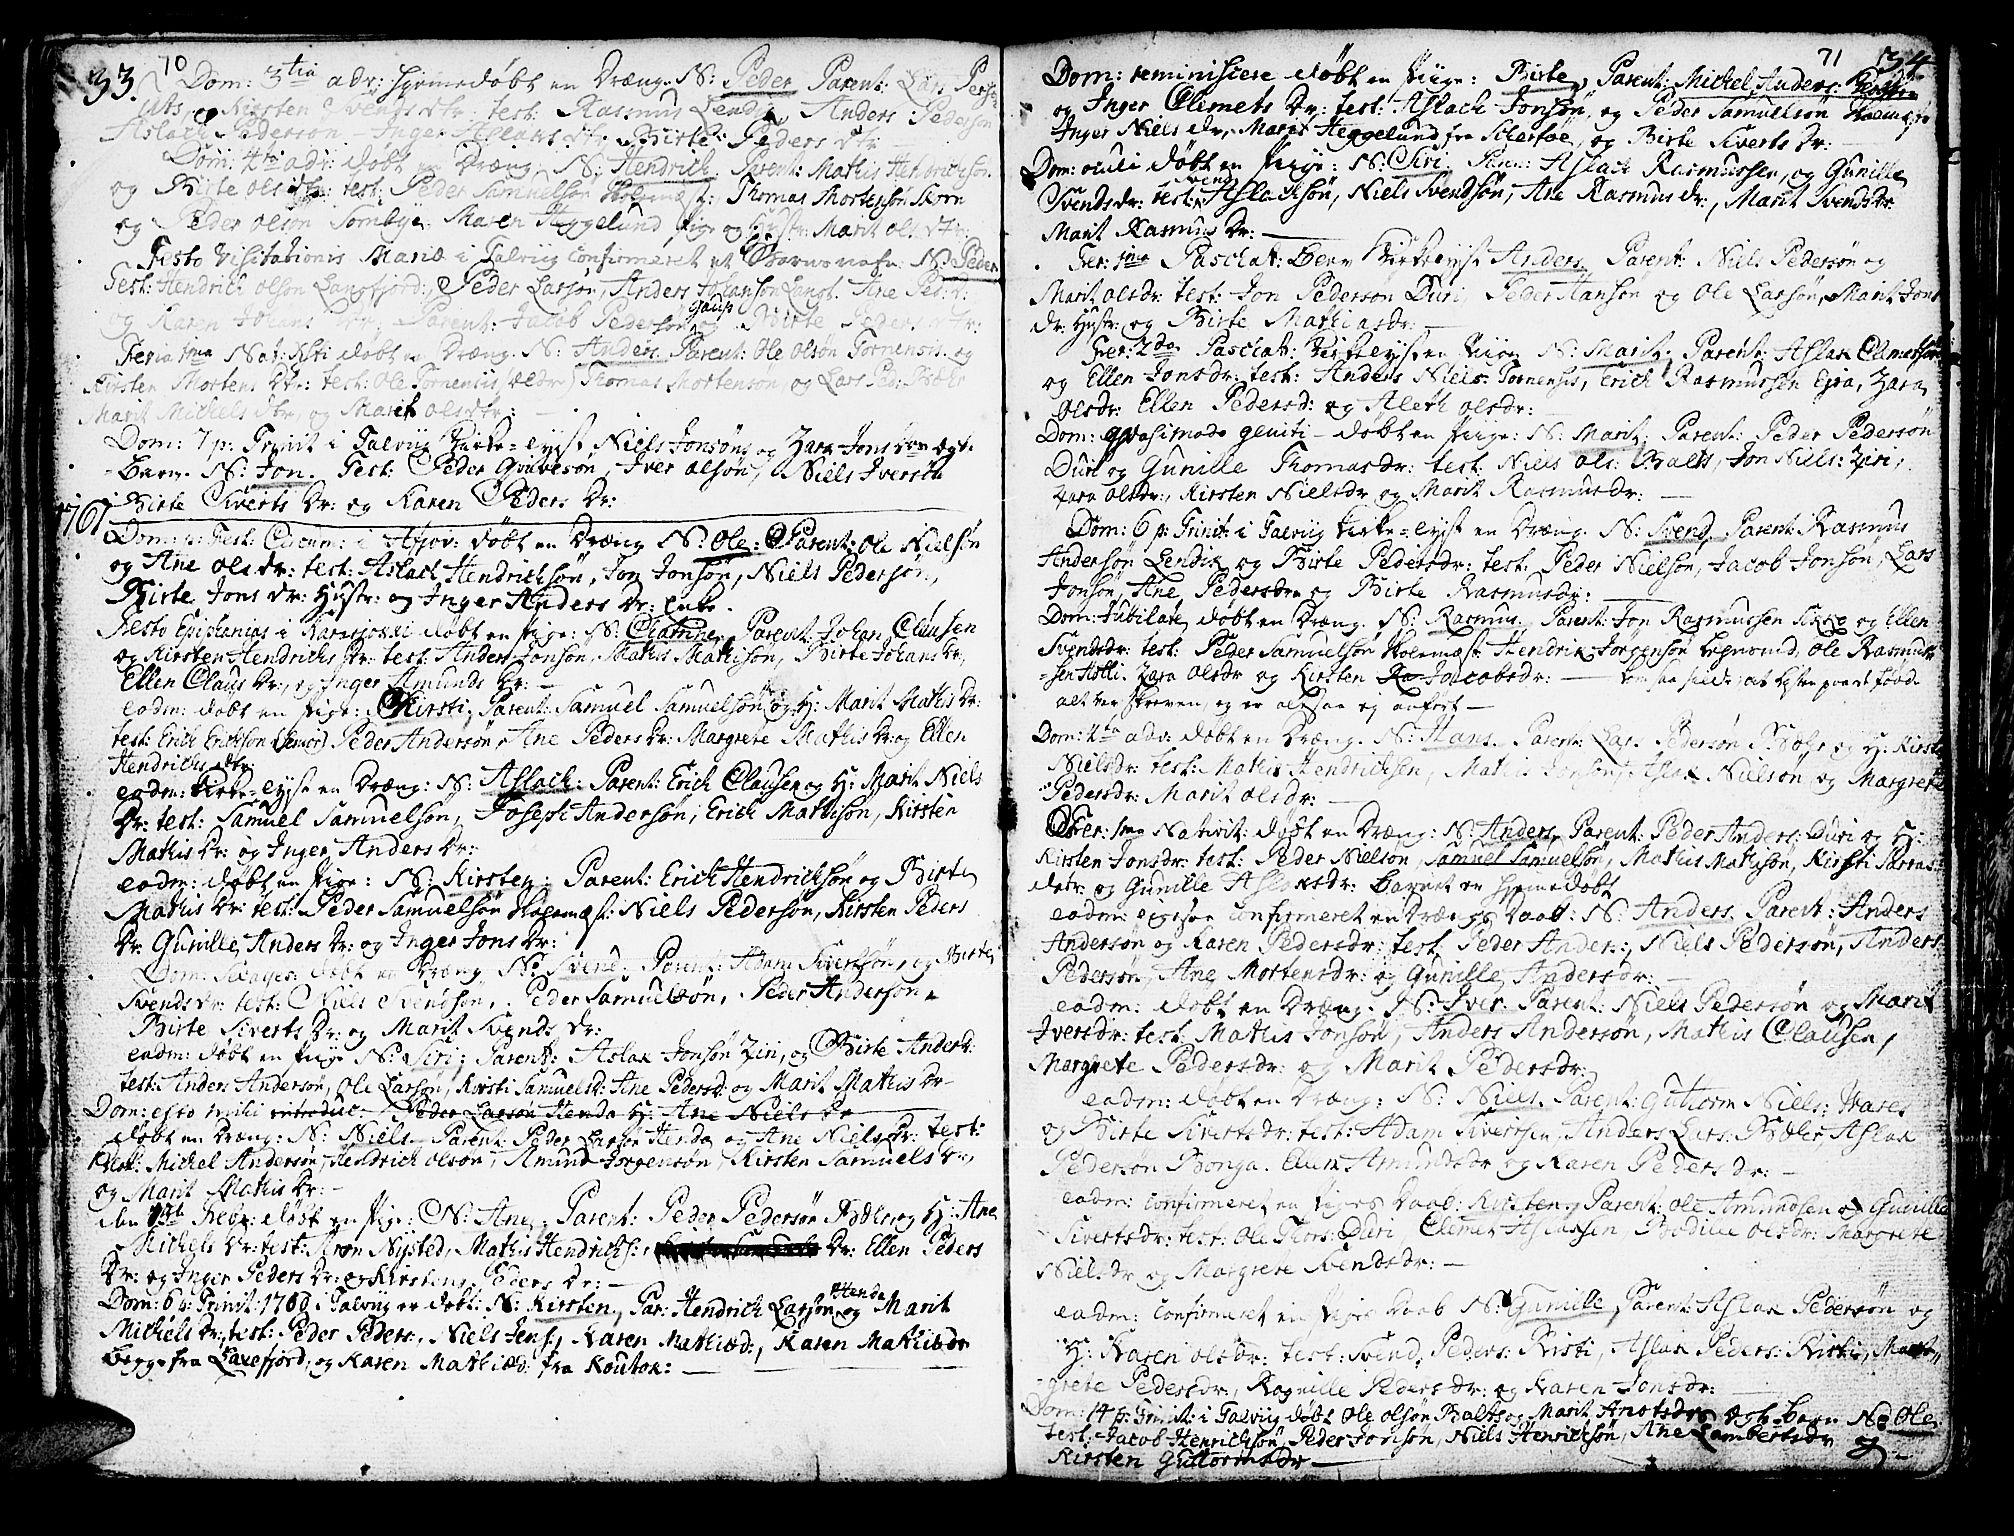 SATØ, Kautokeino sokneprestembete, H/Ha/L0001.kirke: Ministerialbok nr. 1, 1723-1776, s. 70-71